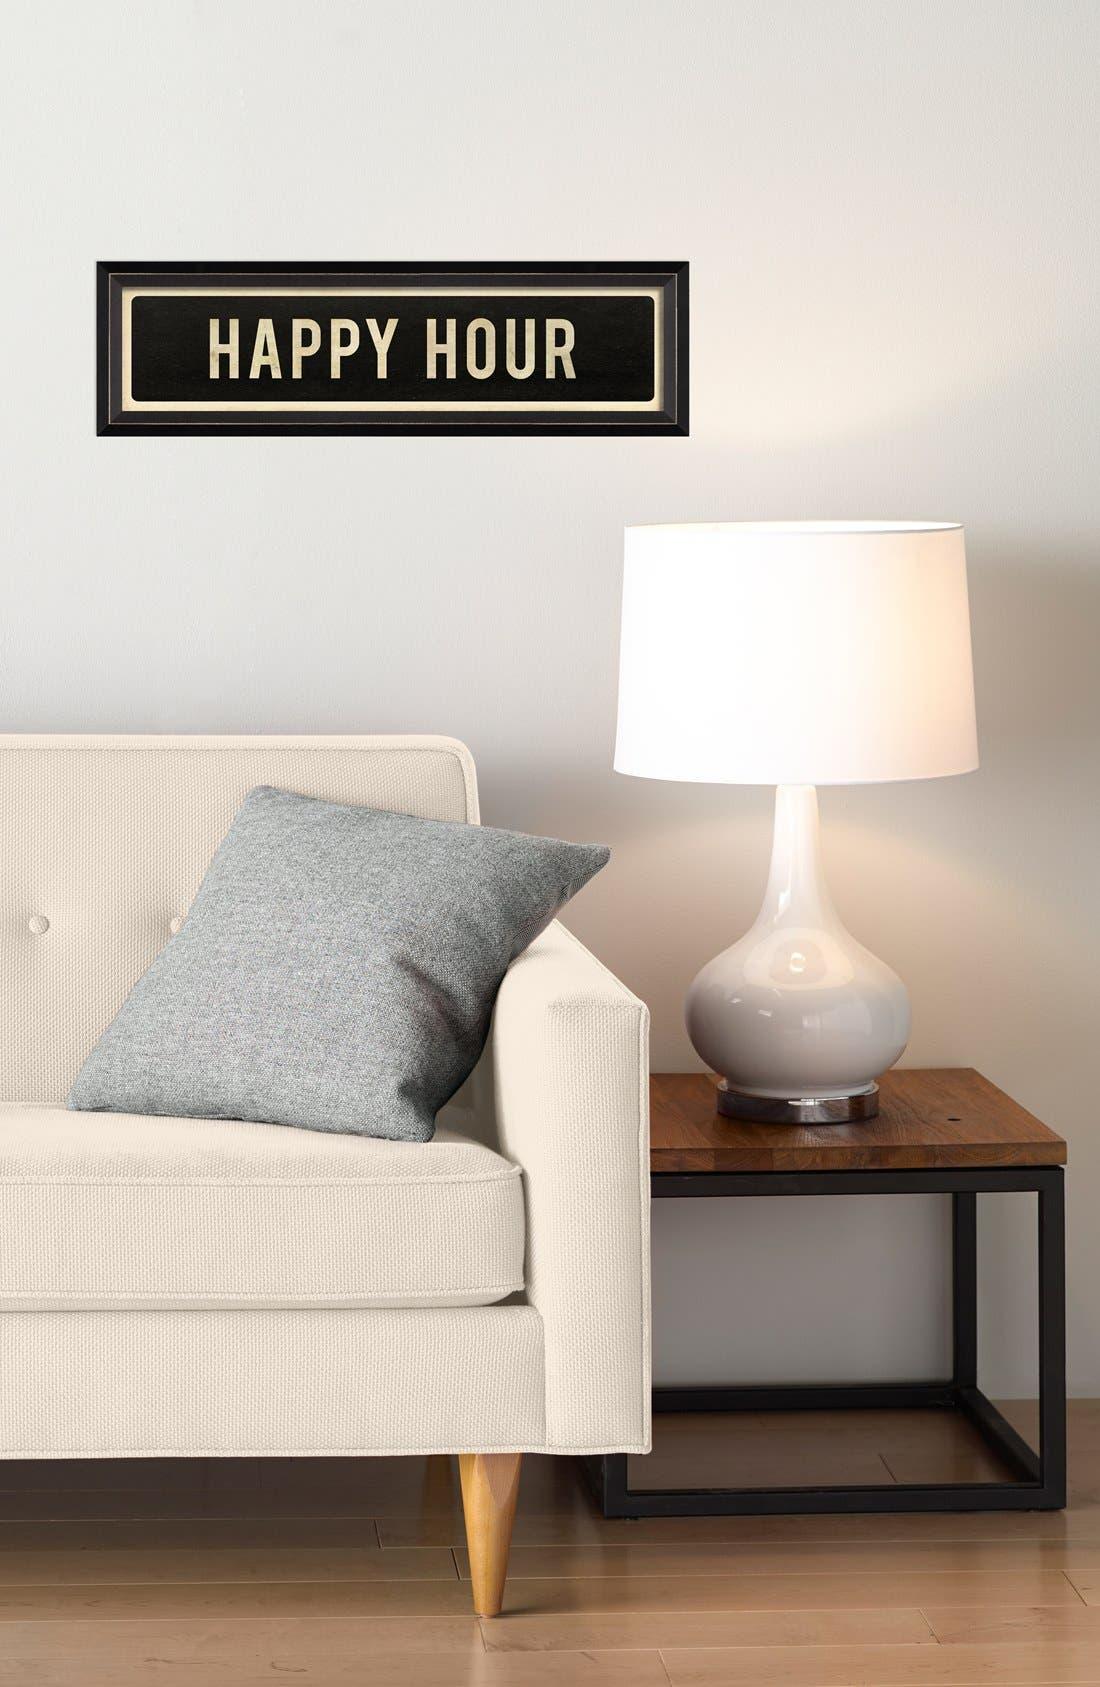 'Happy Hour' Vintage Look Street Sign Artwork,                             Alternate thumbnail 2, color,                             Black